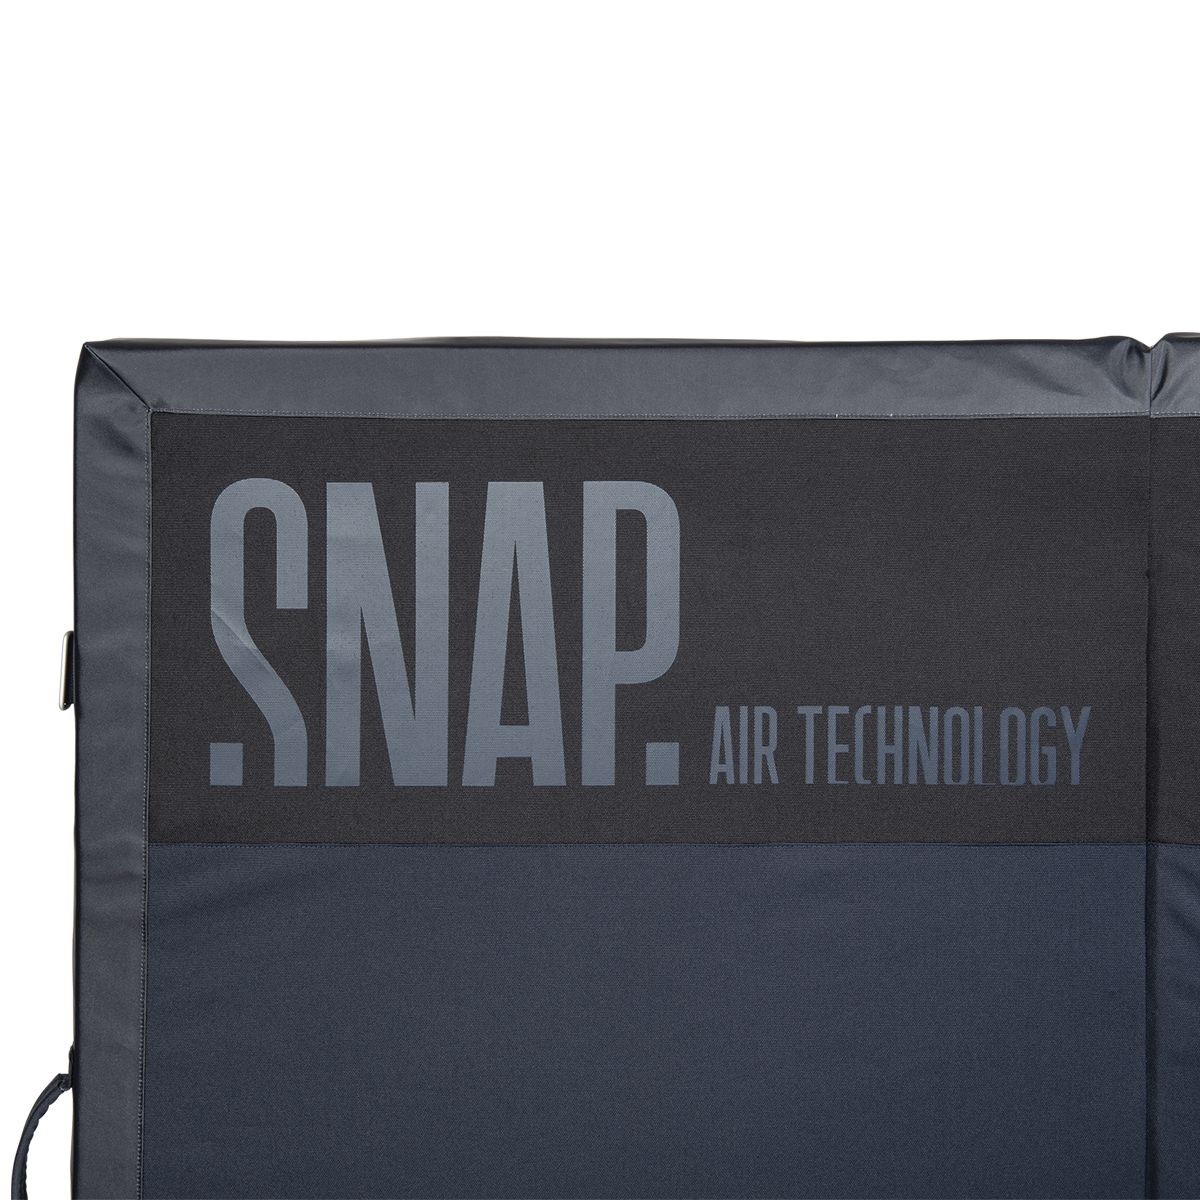 snap logo on a crash pad grand guts